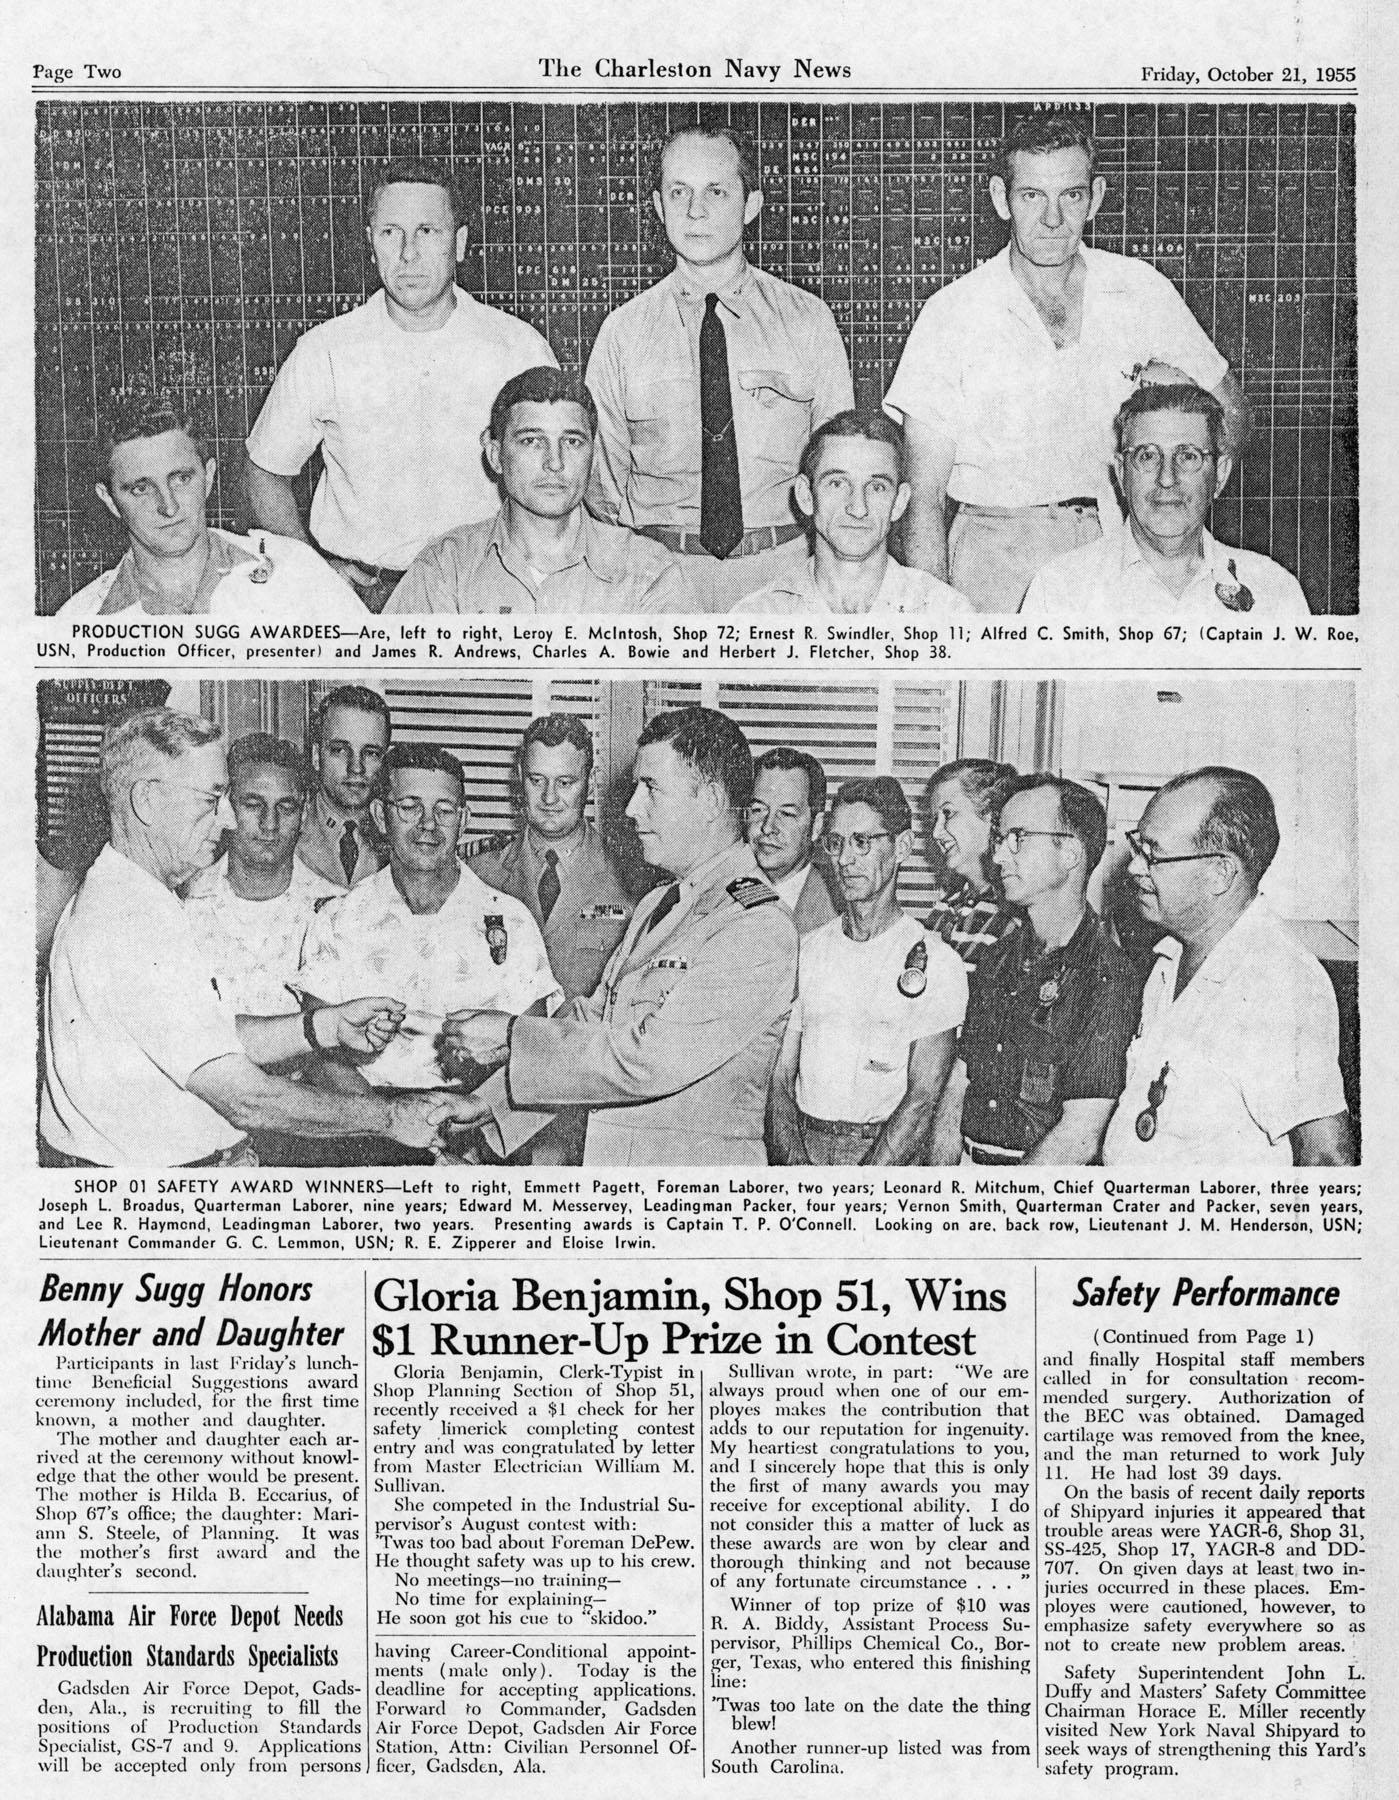 The Charleston Navy News, Volume 14, Edition 7, page ii